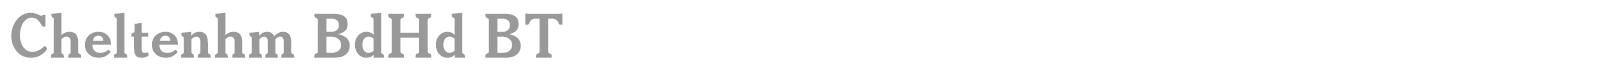 cheltenham bdhd bt font